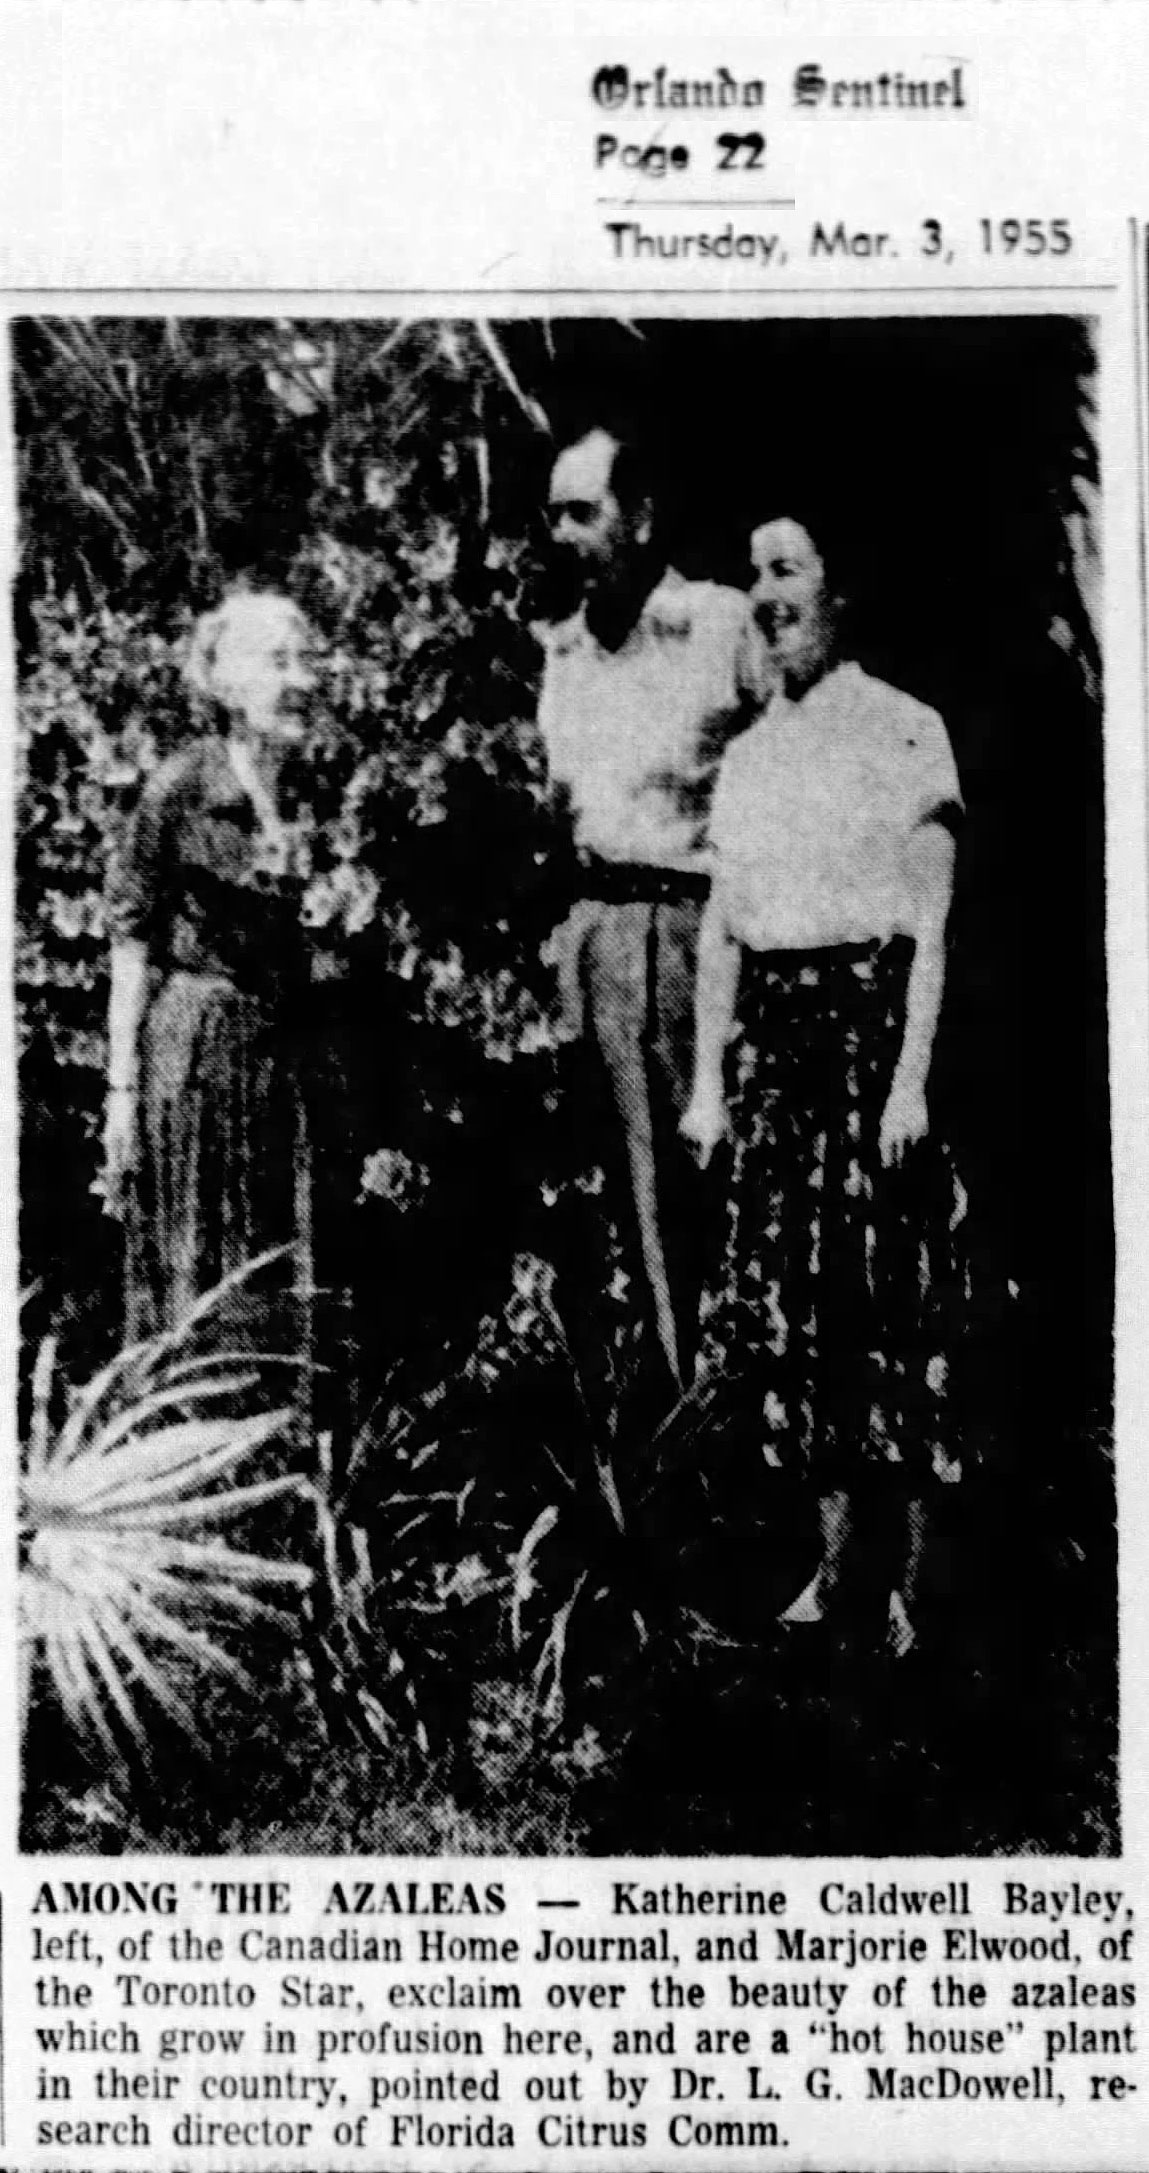 Katherine Caldwell Bayley in Florida, 1955